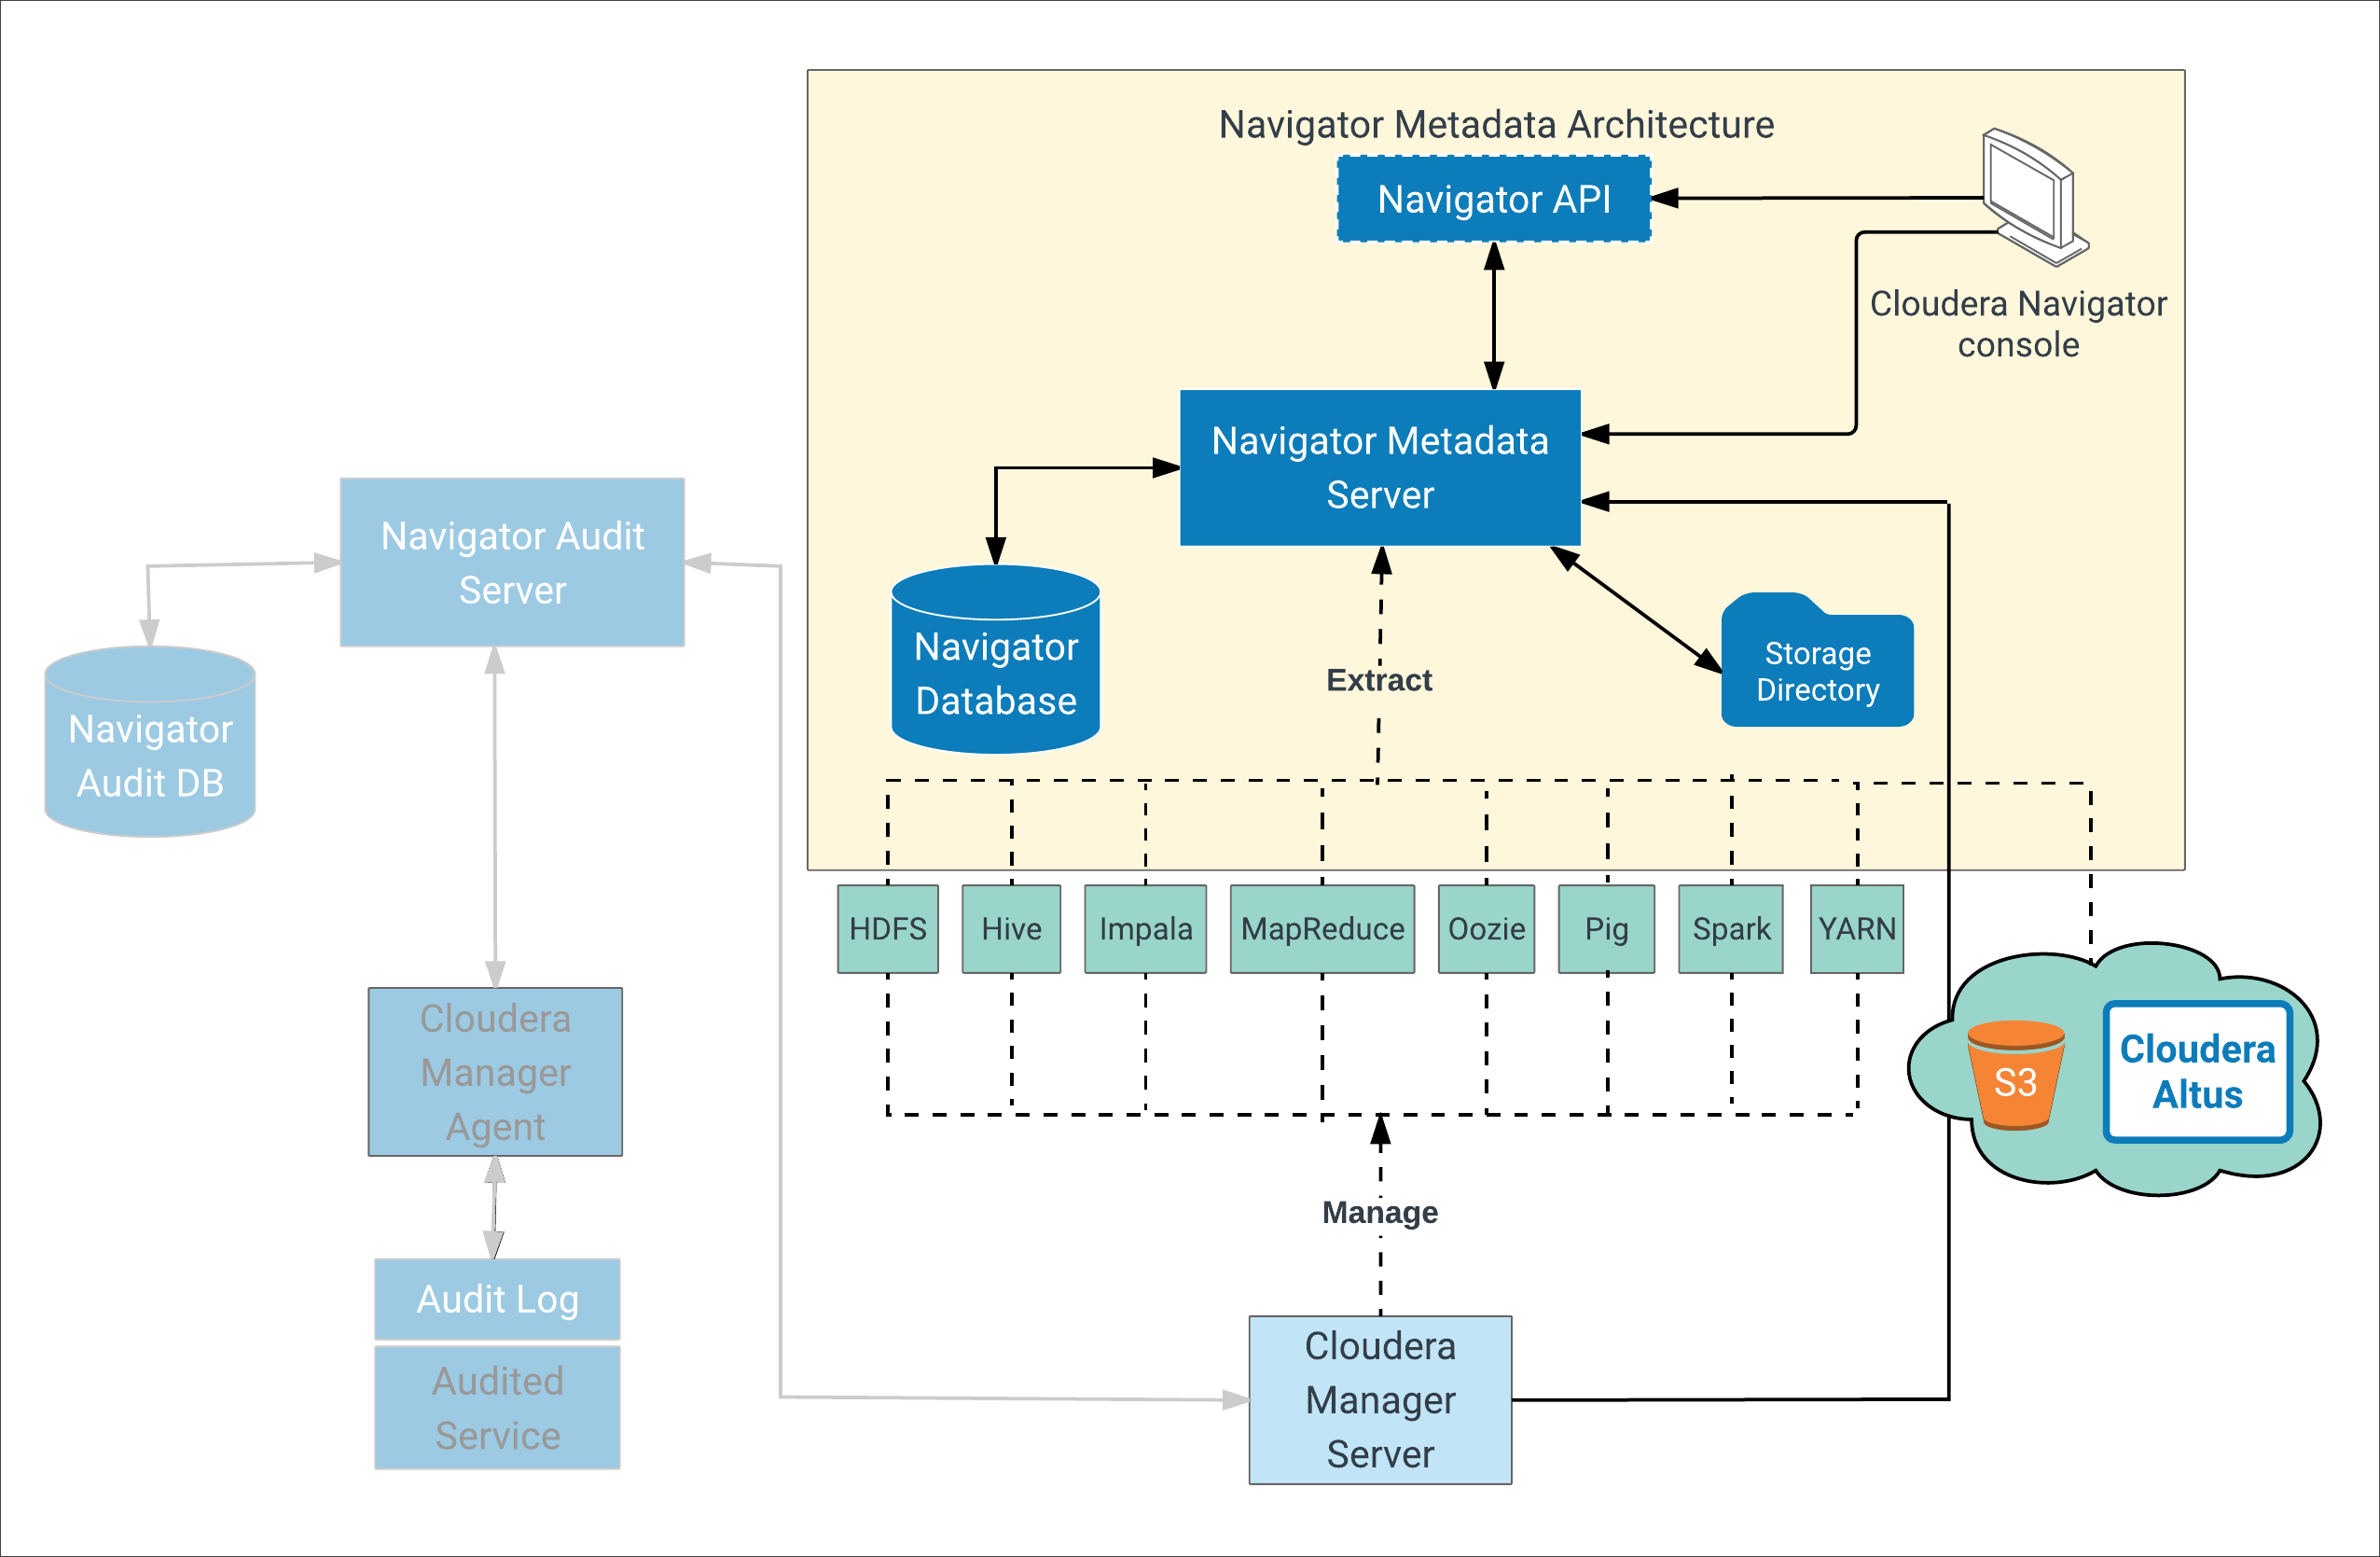 Navigator Metadata Server Management   5.13.x   Cloudera Documentation